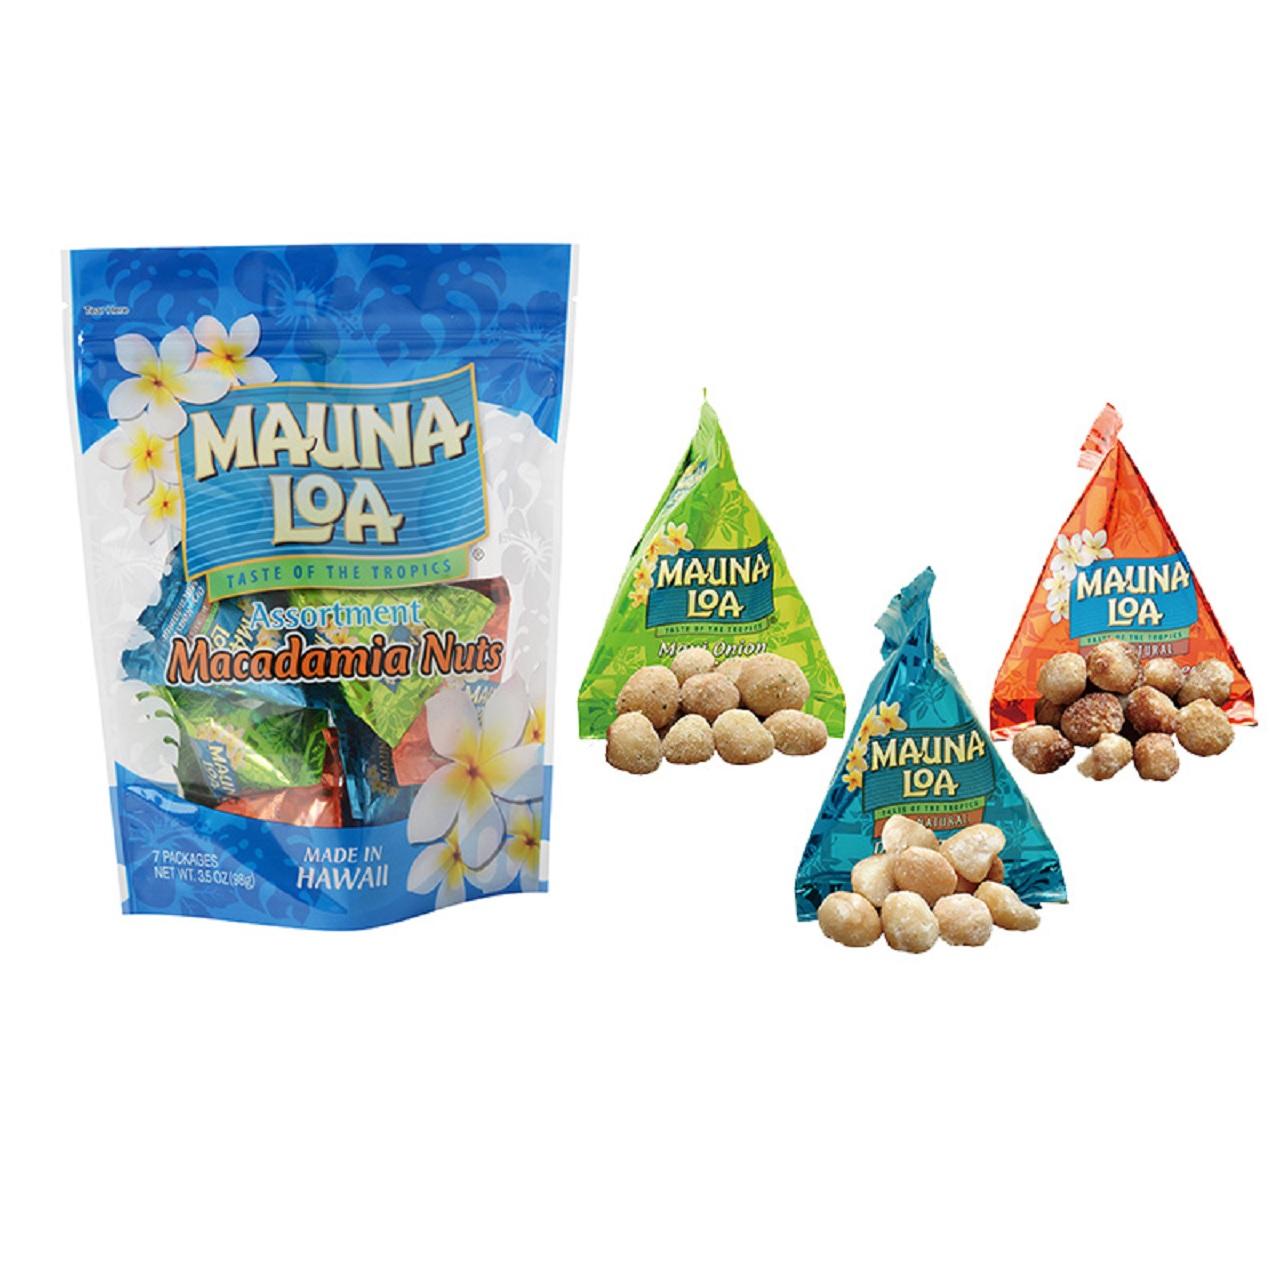 【MAUNA LOA】マウナロア マカデミアナッツミニアソートバッグ98g(hhca670ws)